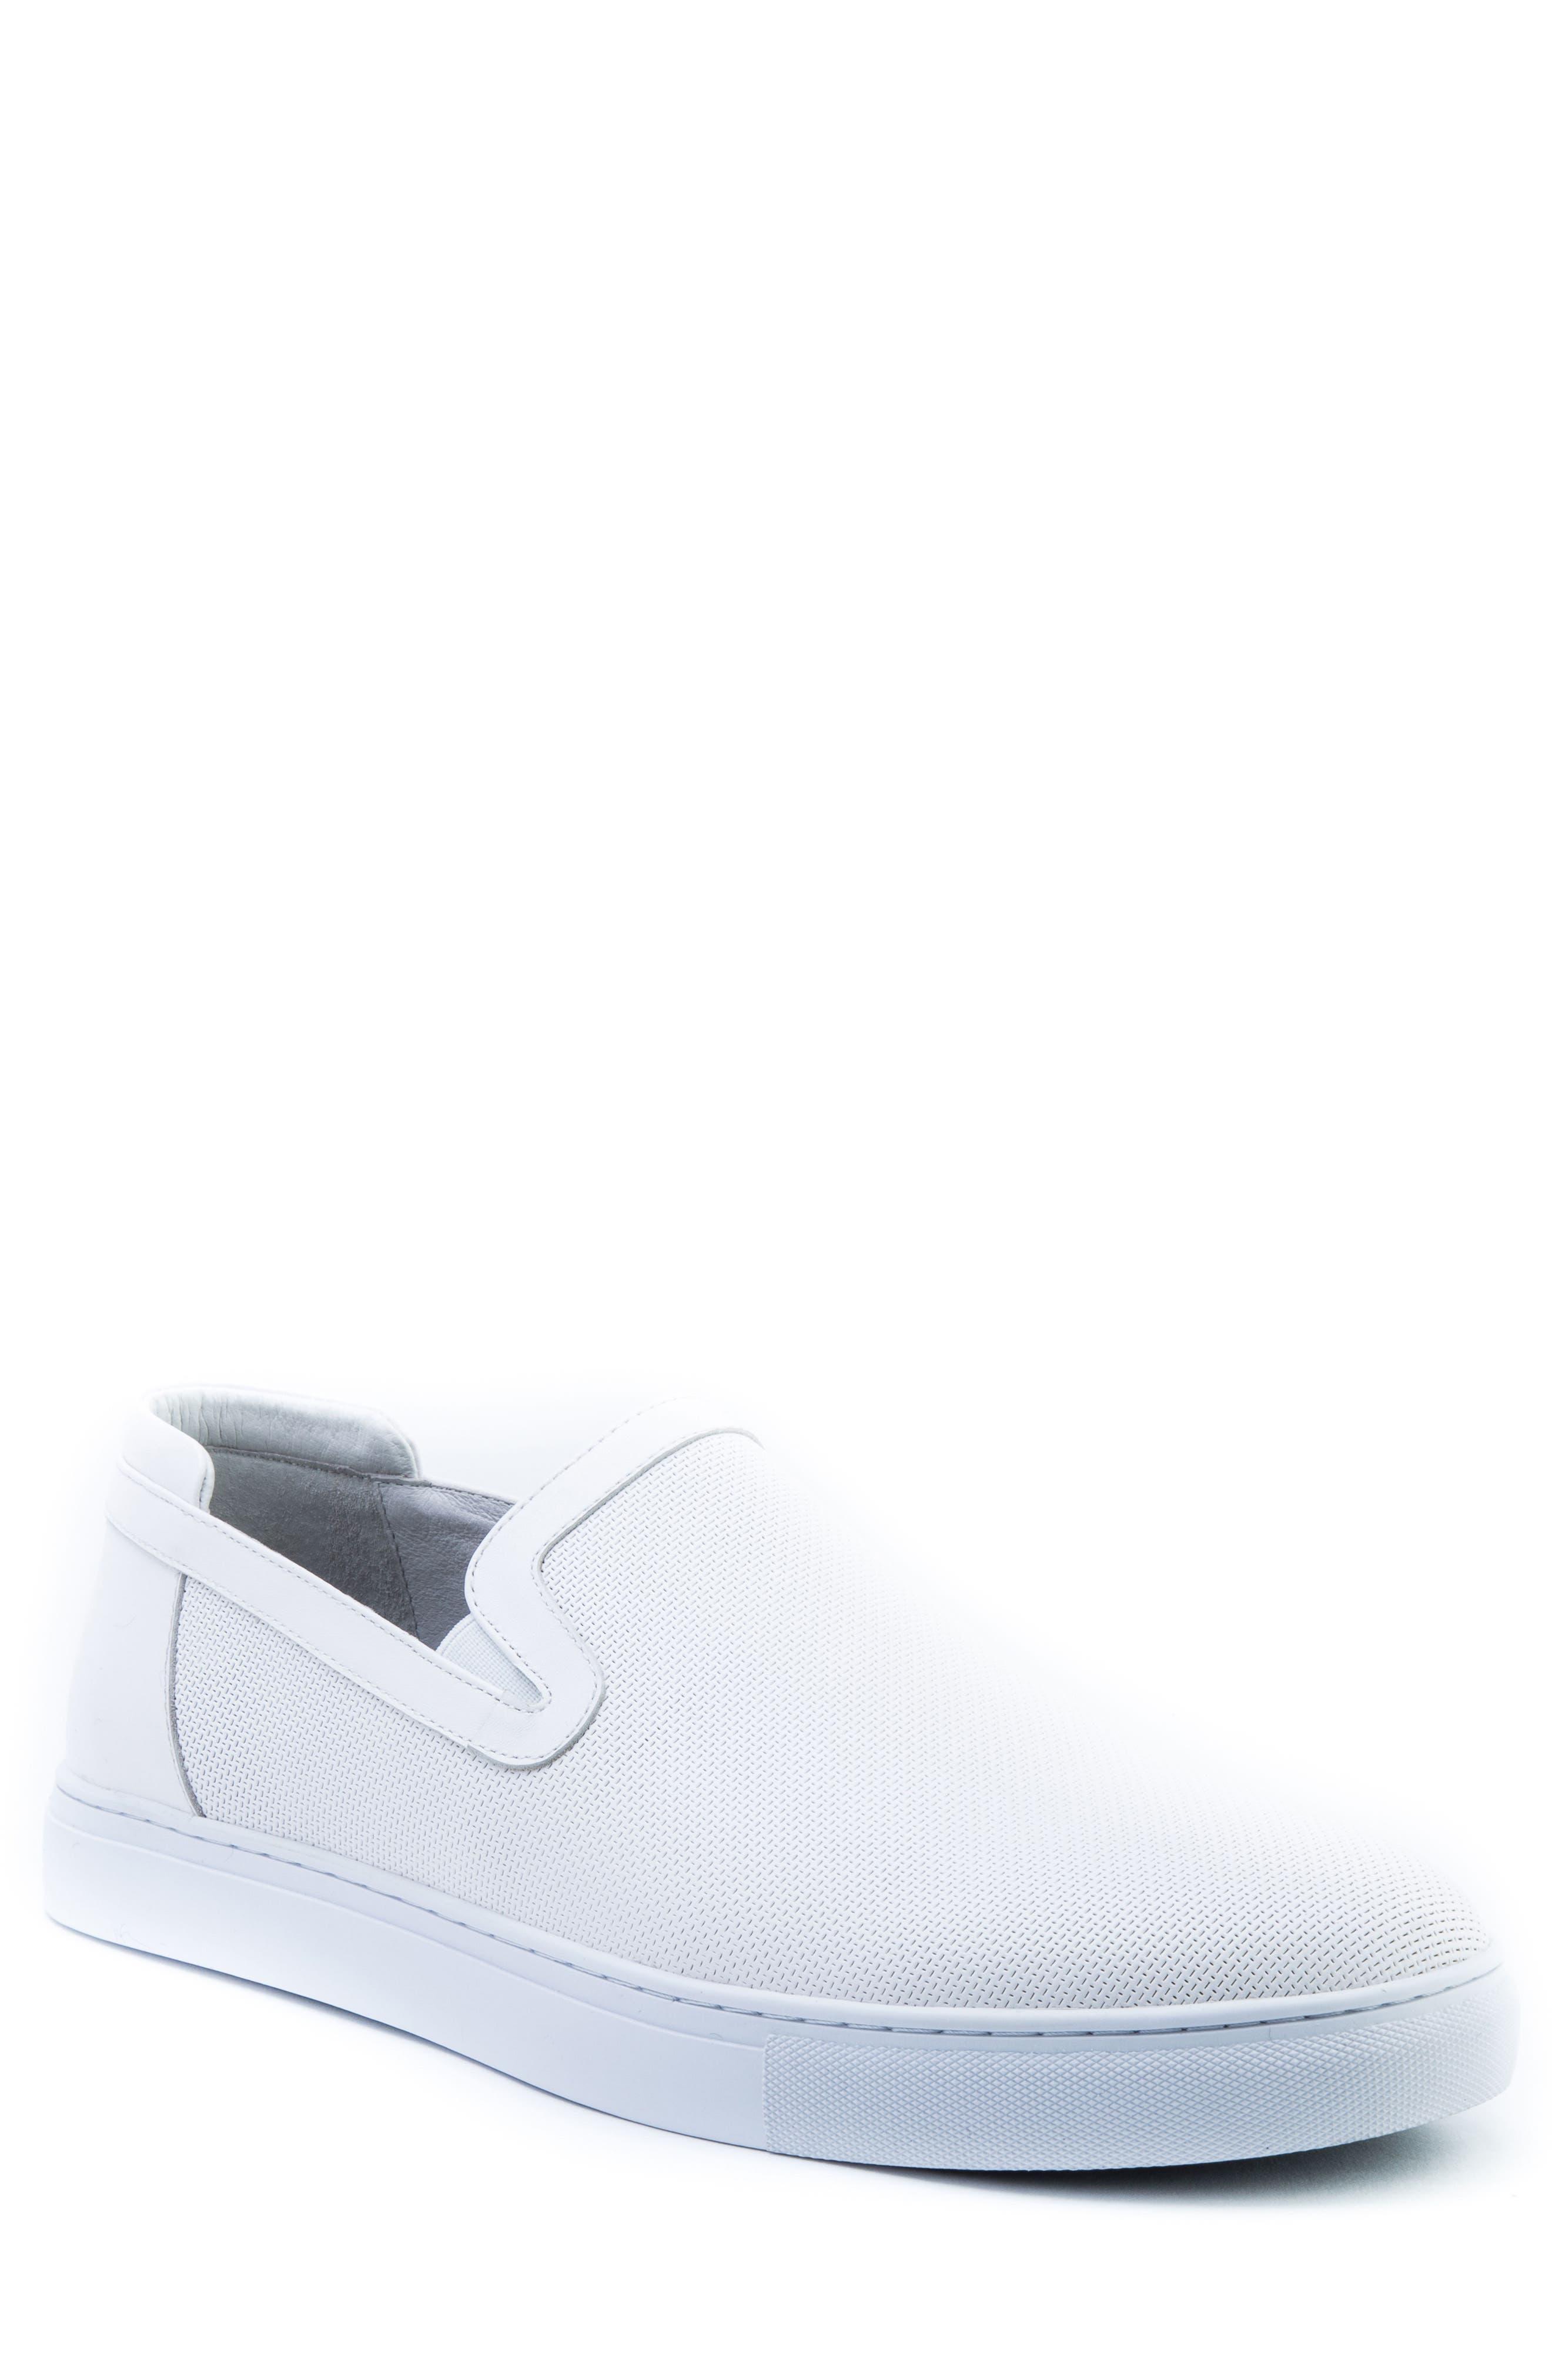 Grant Sneaker,                             Main thumbnail 1, color,                             White Leather